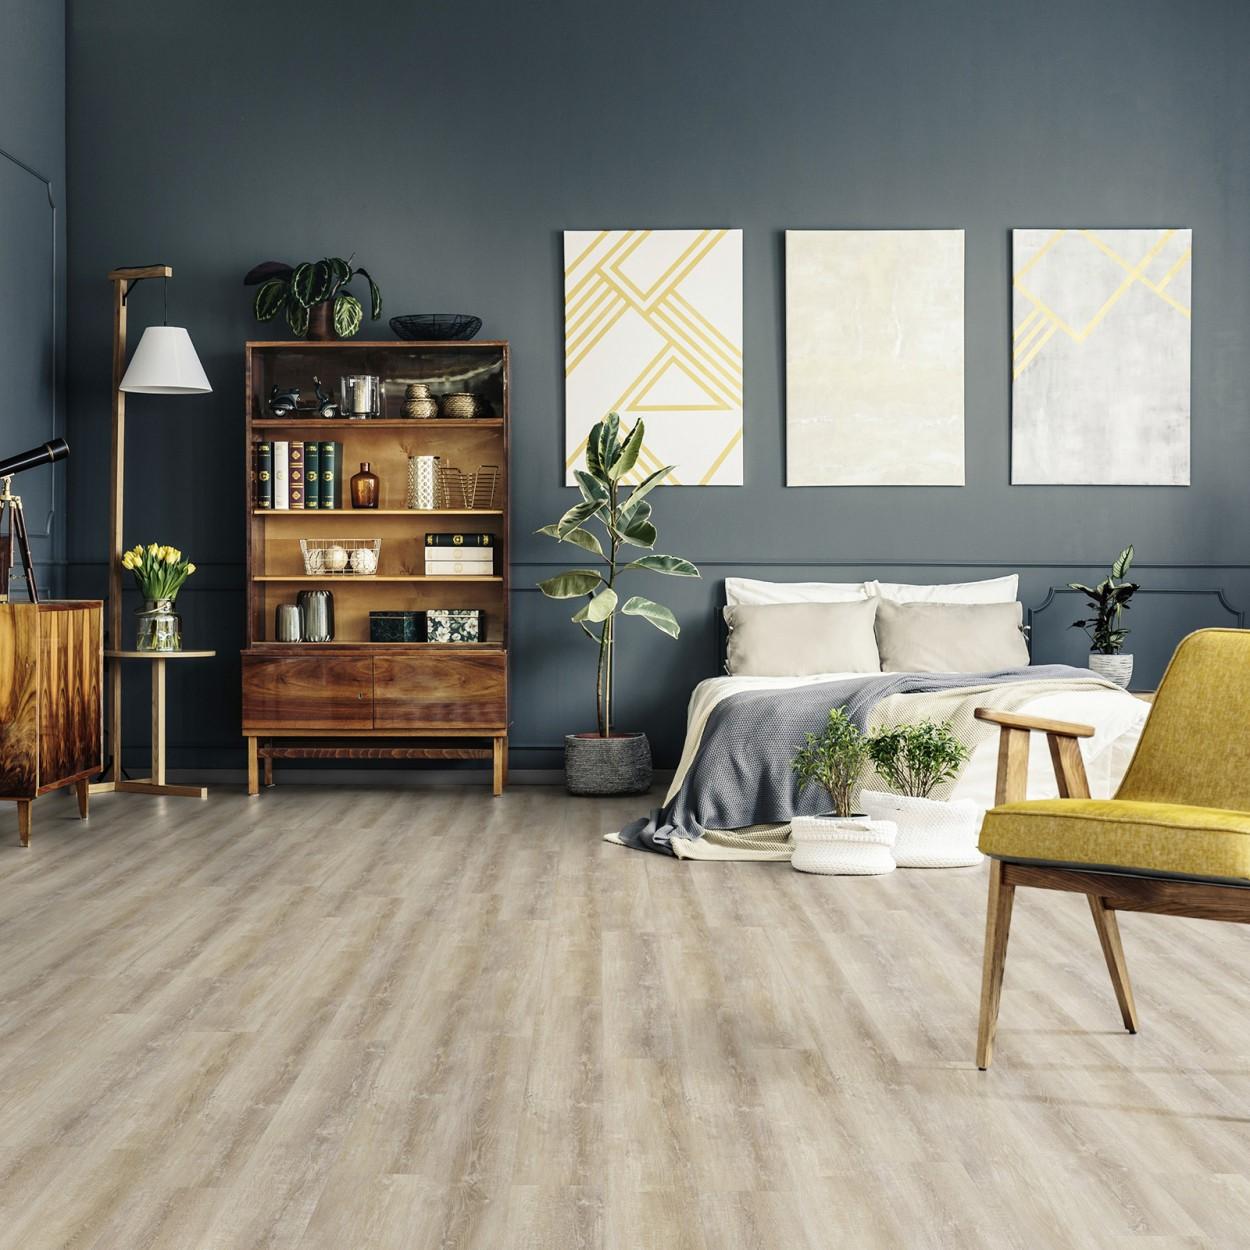 houtlook pvc slaapkamer